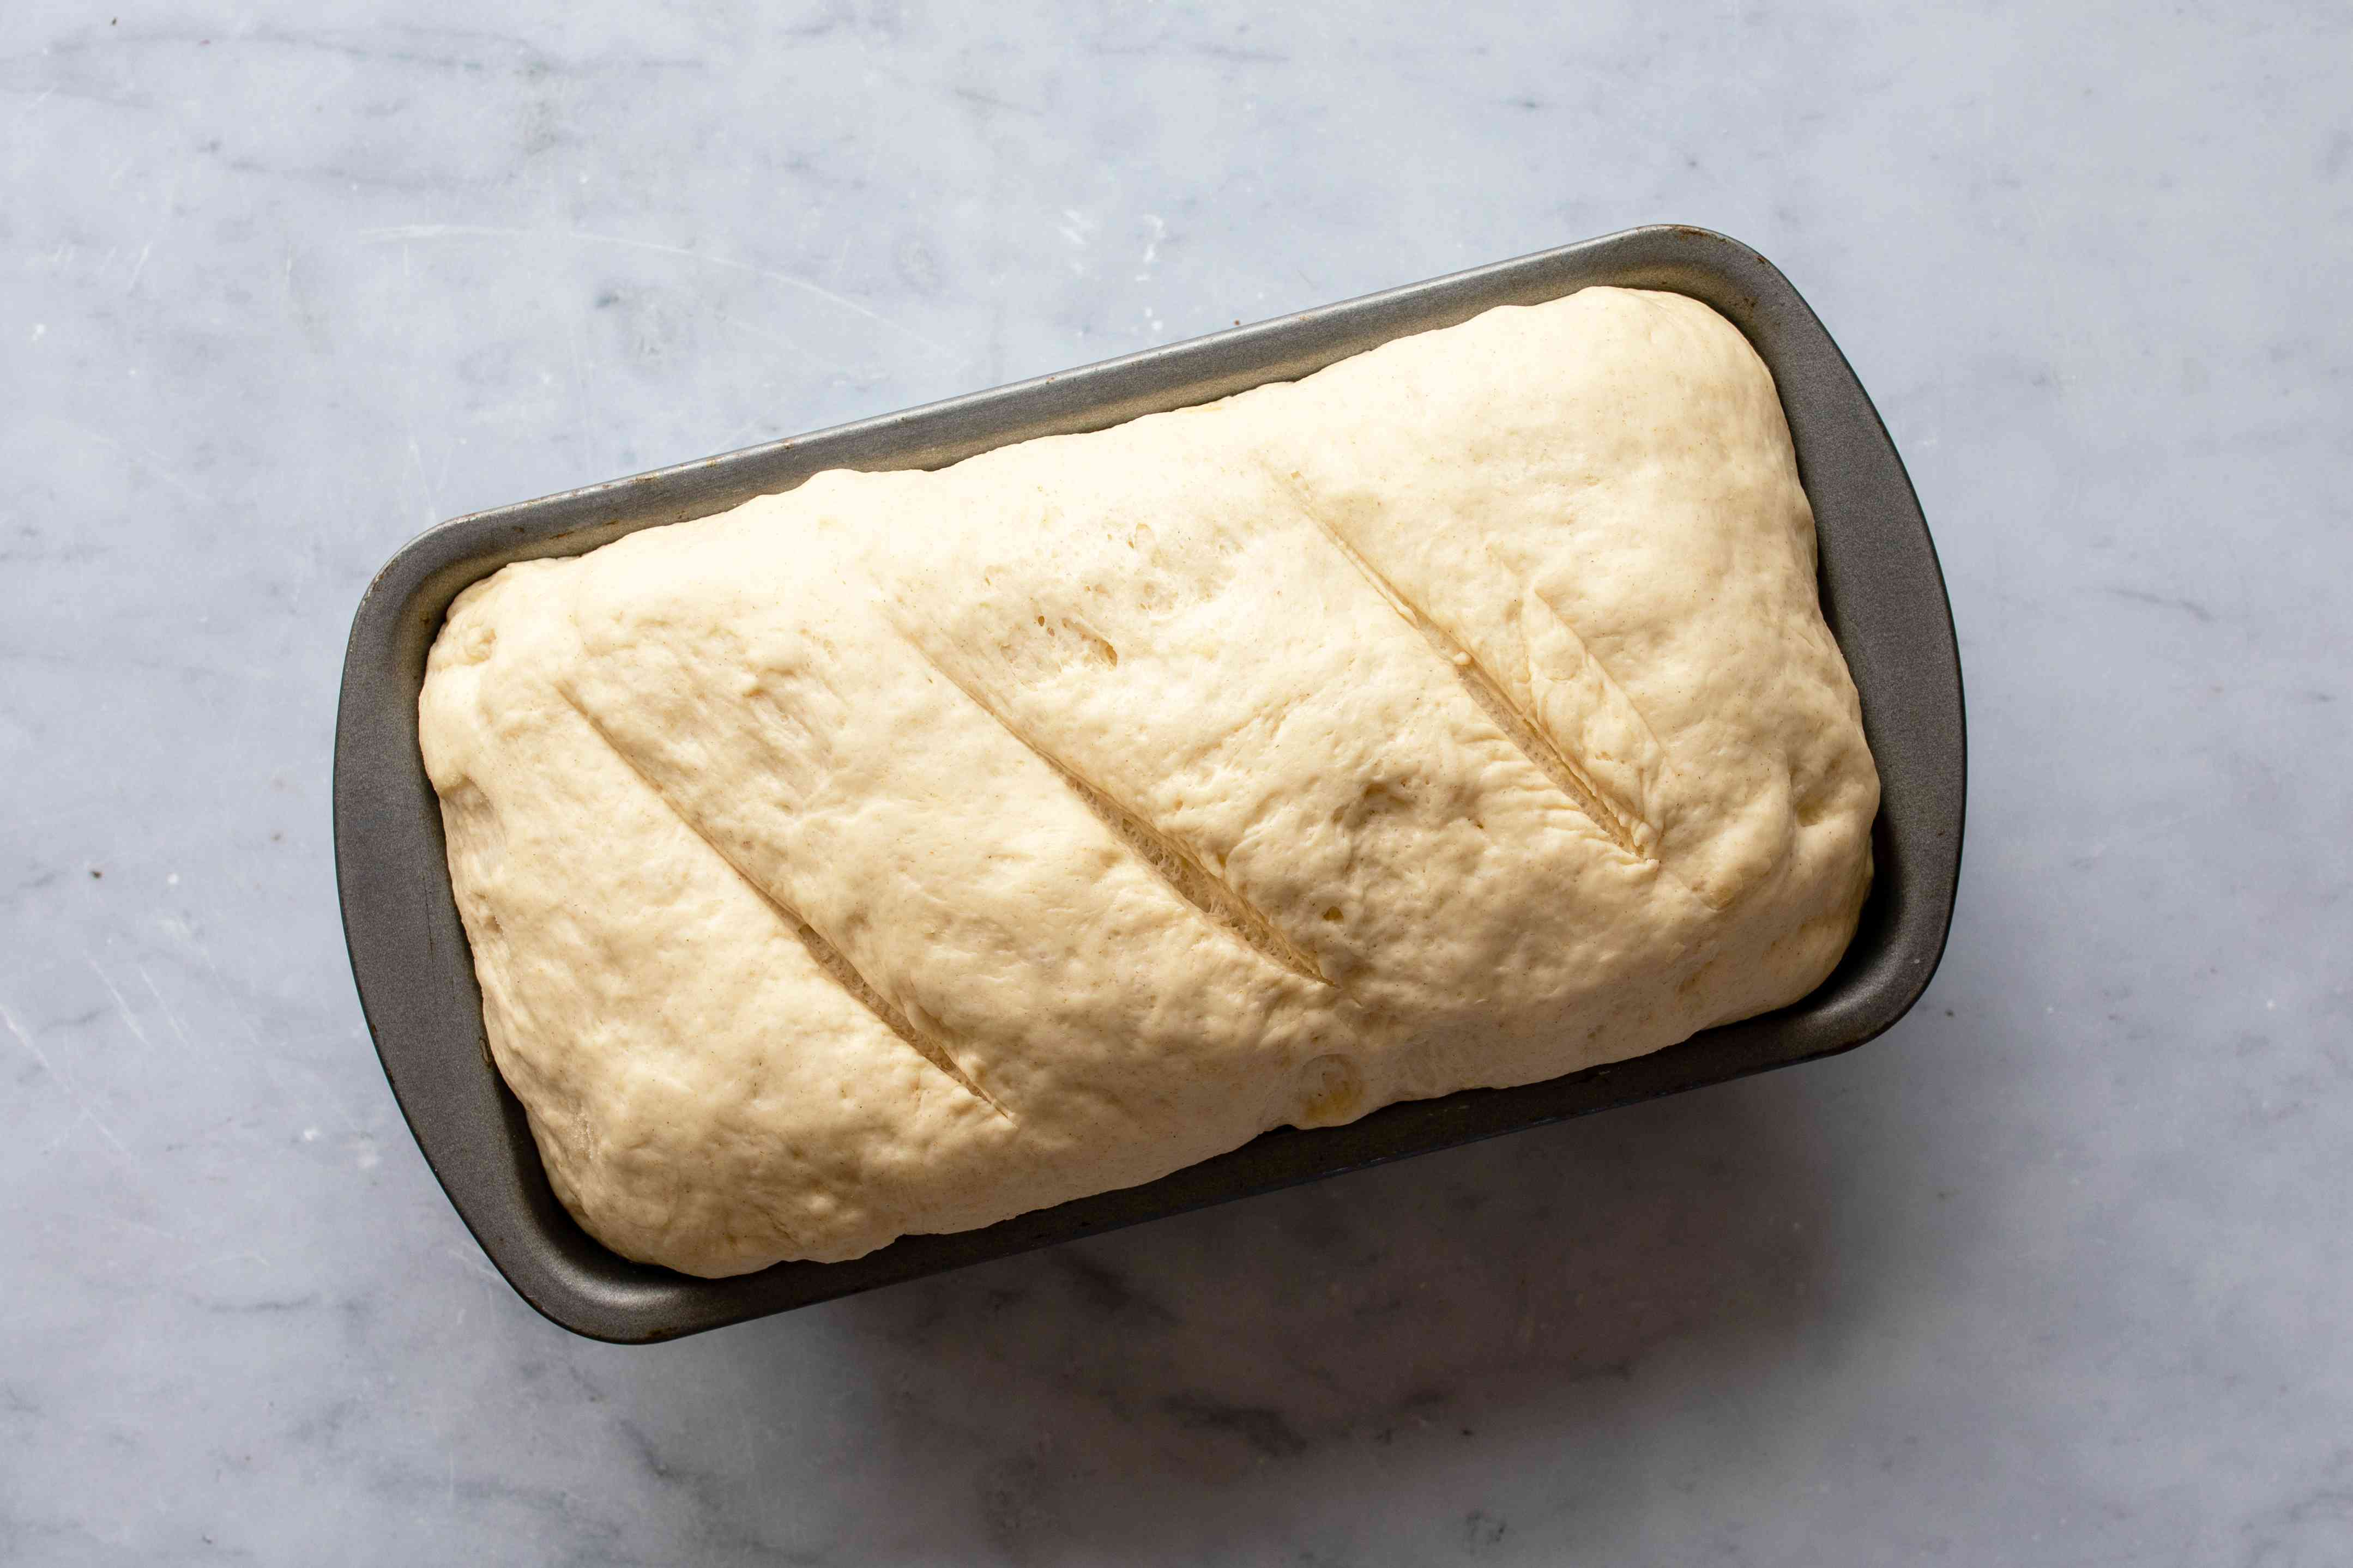 Scoring Bread